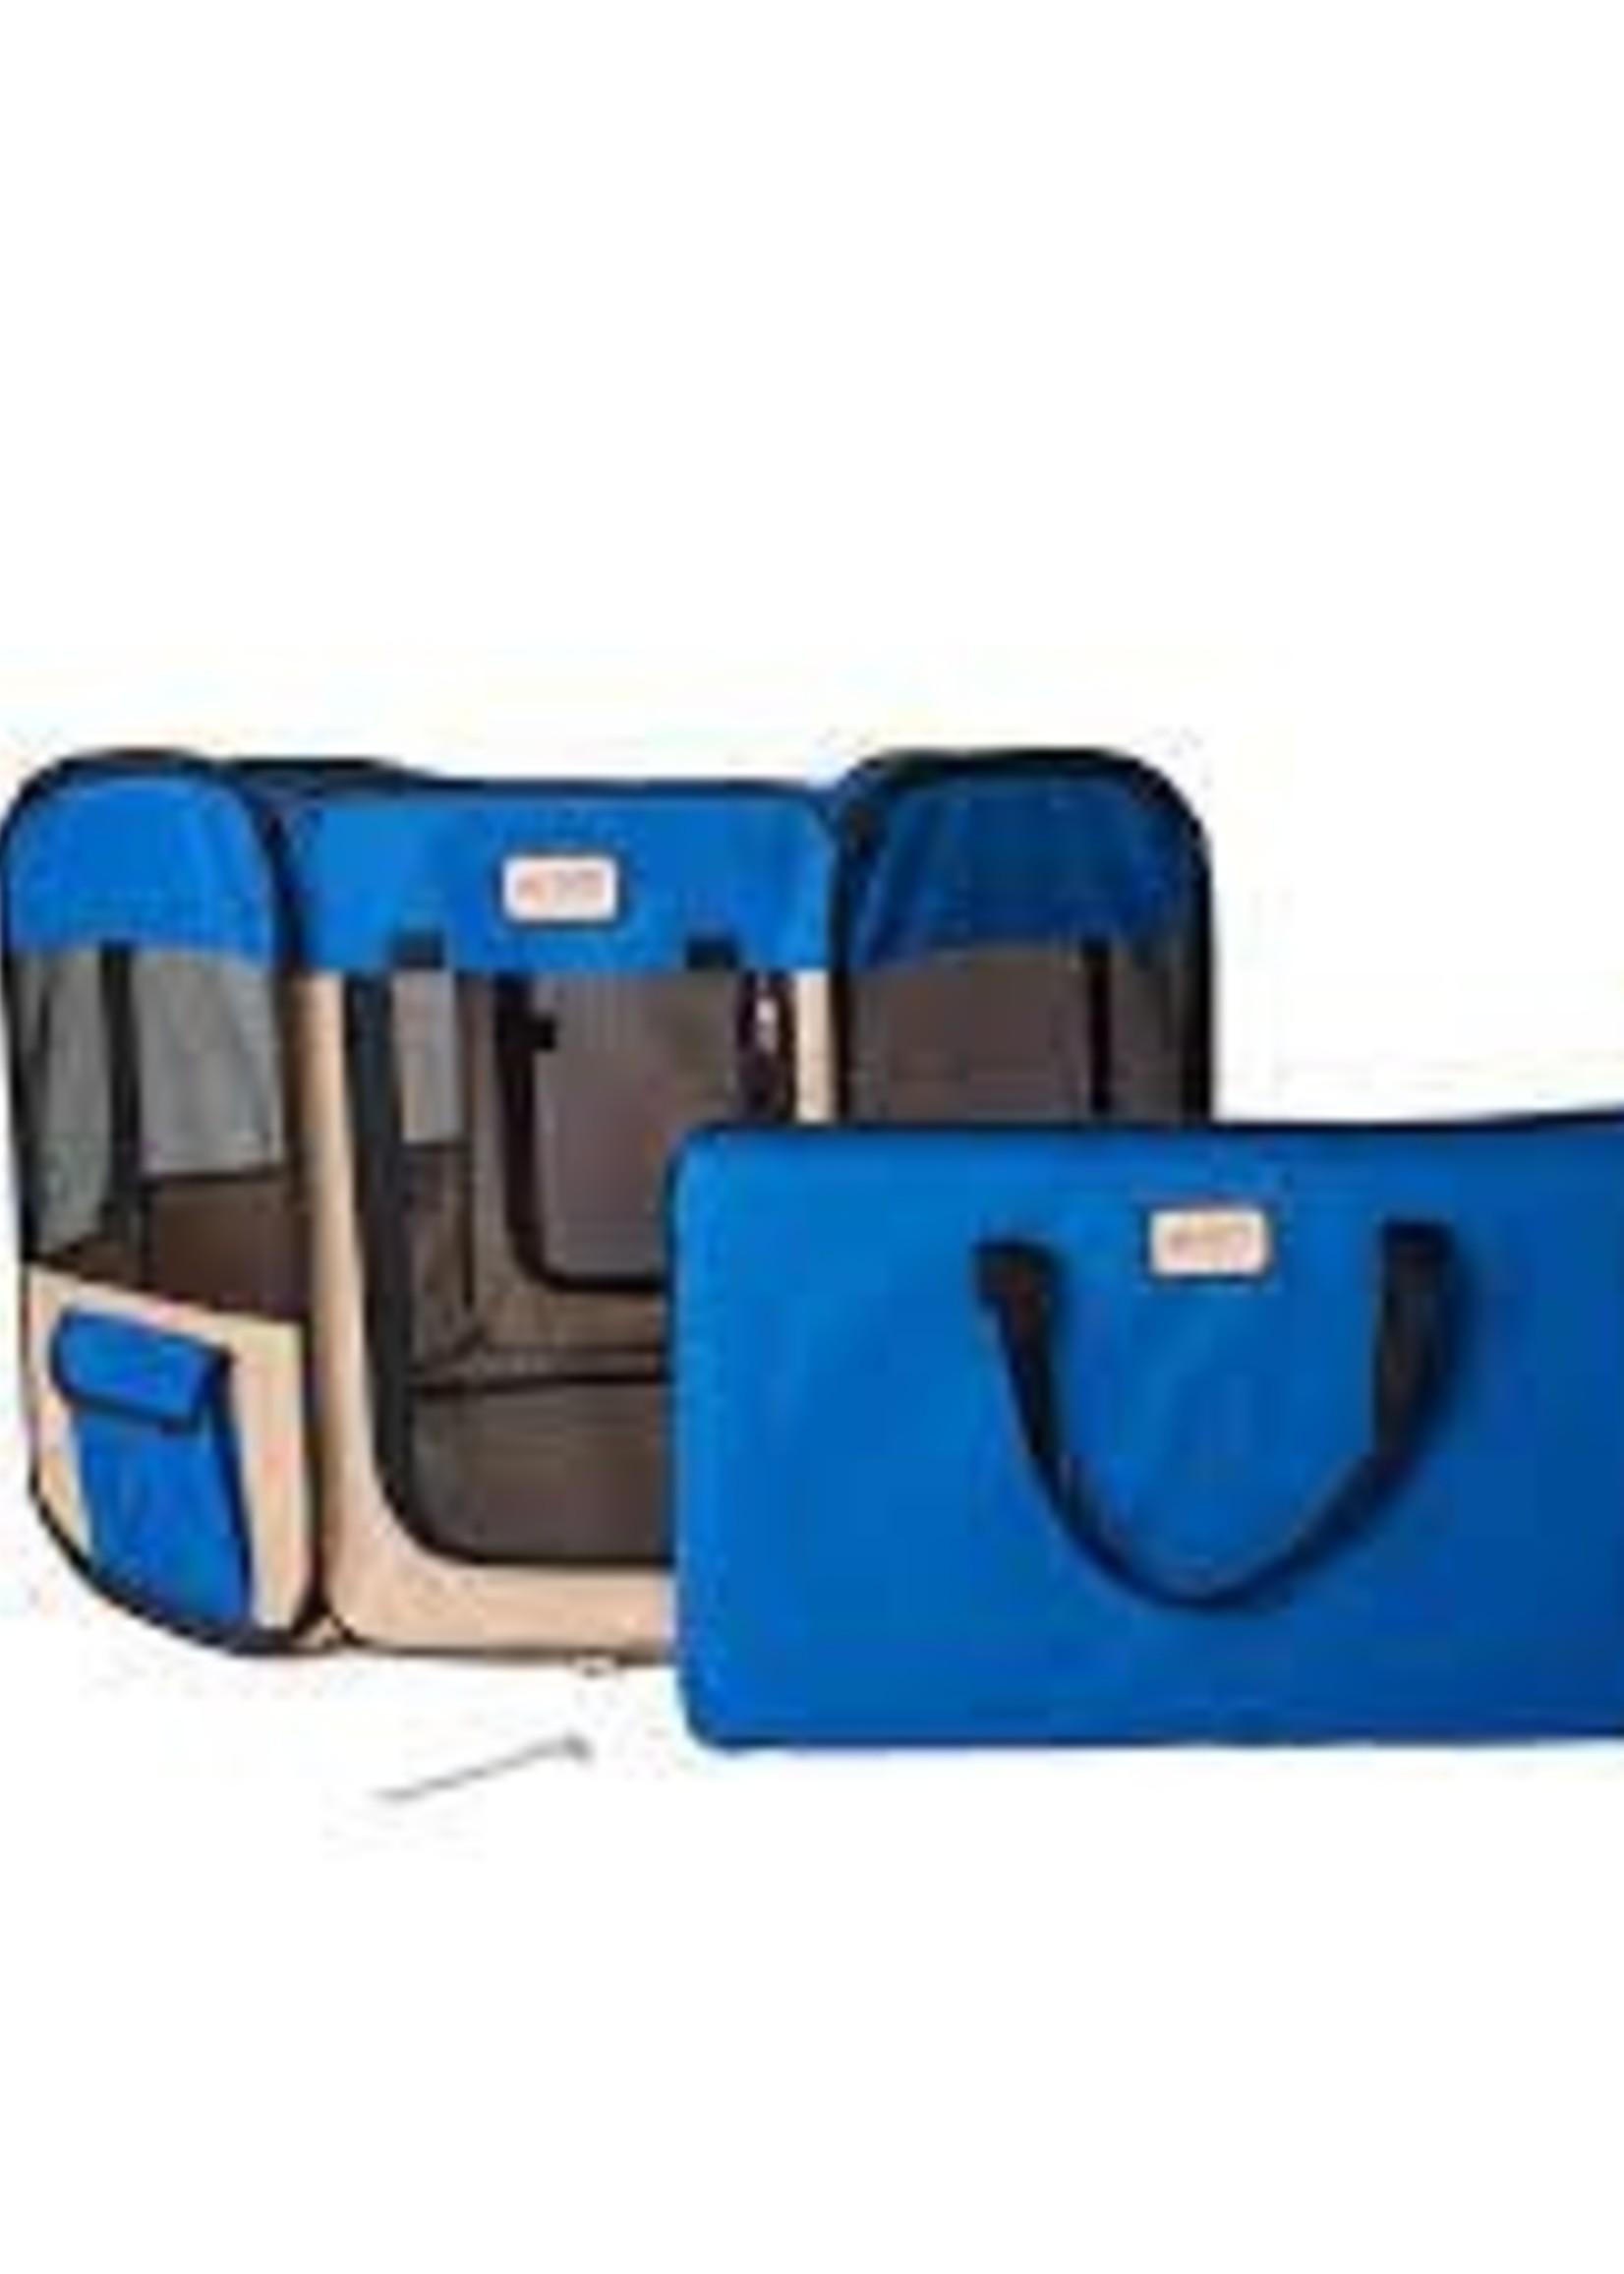 Armarkat Armarkat Med Portable Pet Playpen Combo Blue & Beige